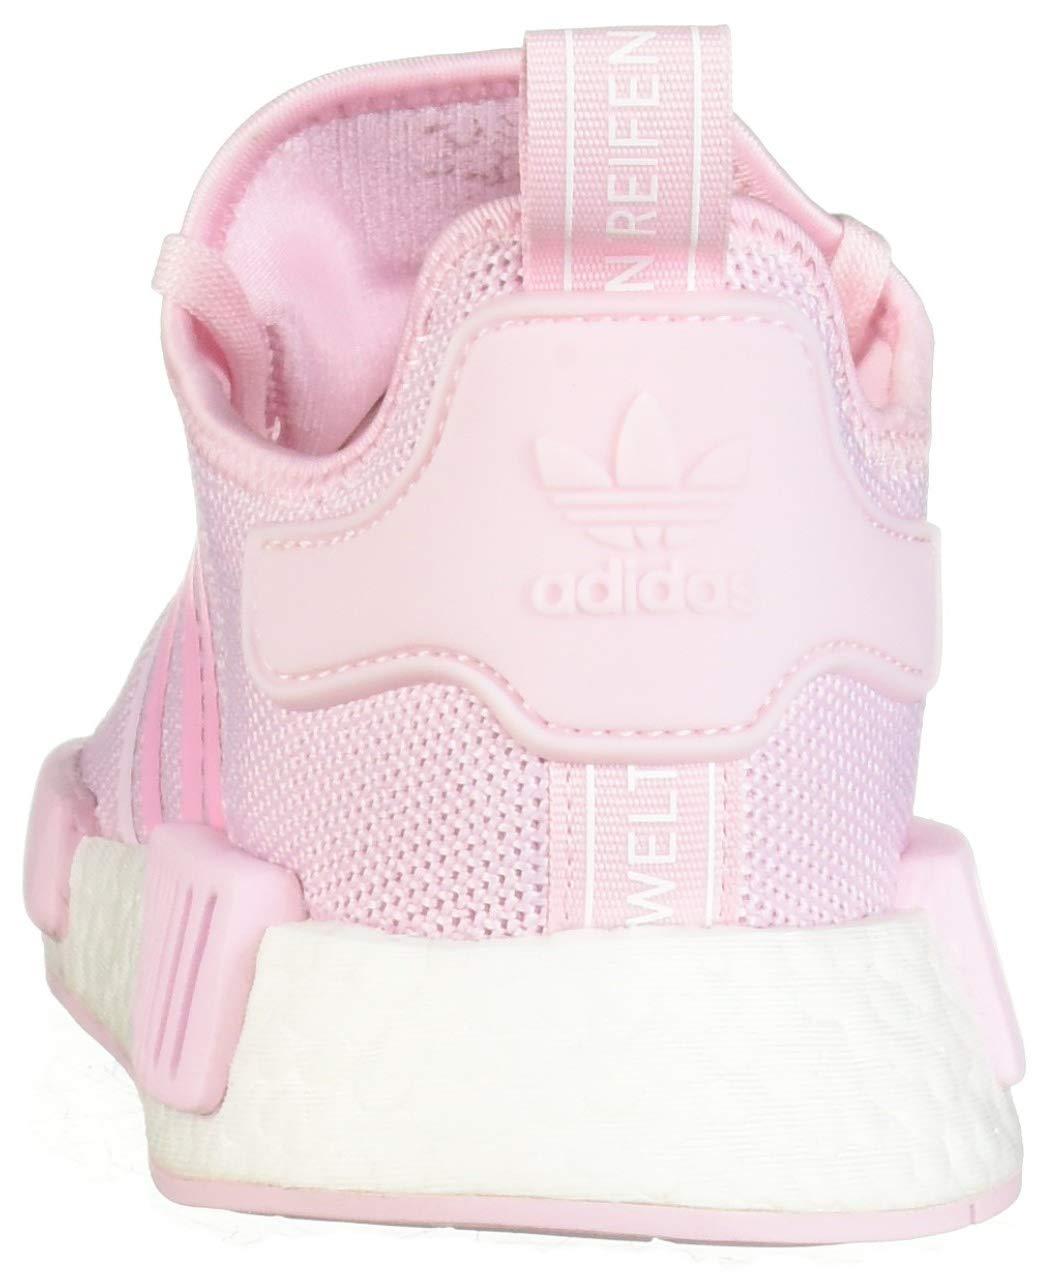 adidas Originals Unisex NMD_R1 Running Shoe Clear Shock Pink/White, 3.5 M US Big Kid by adidas Originals (Image #2)